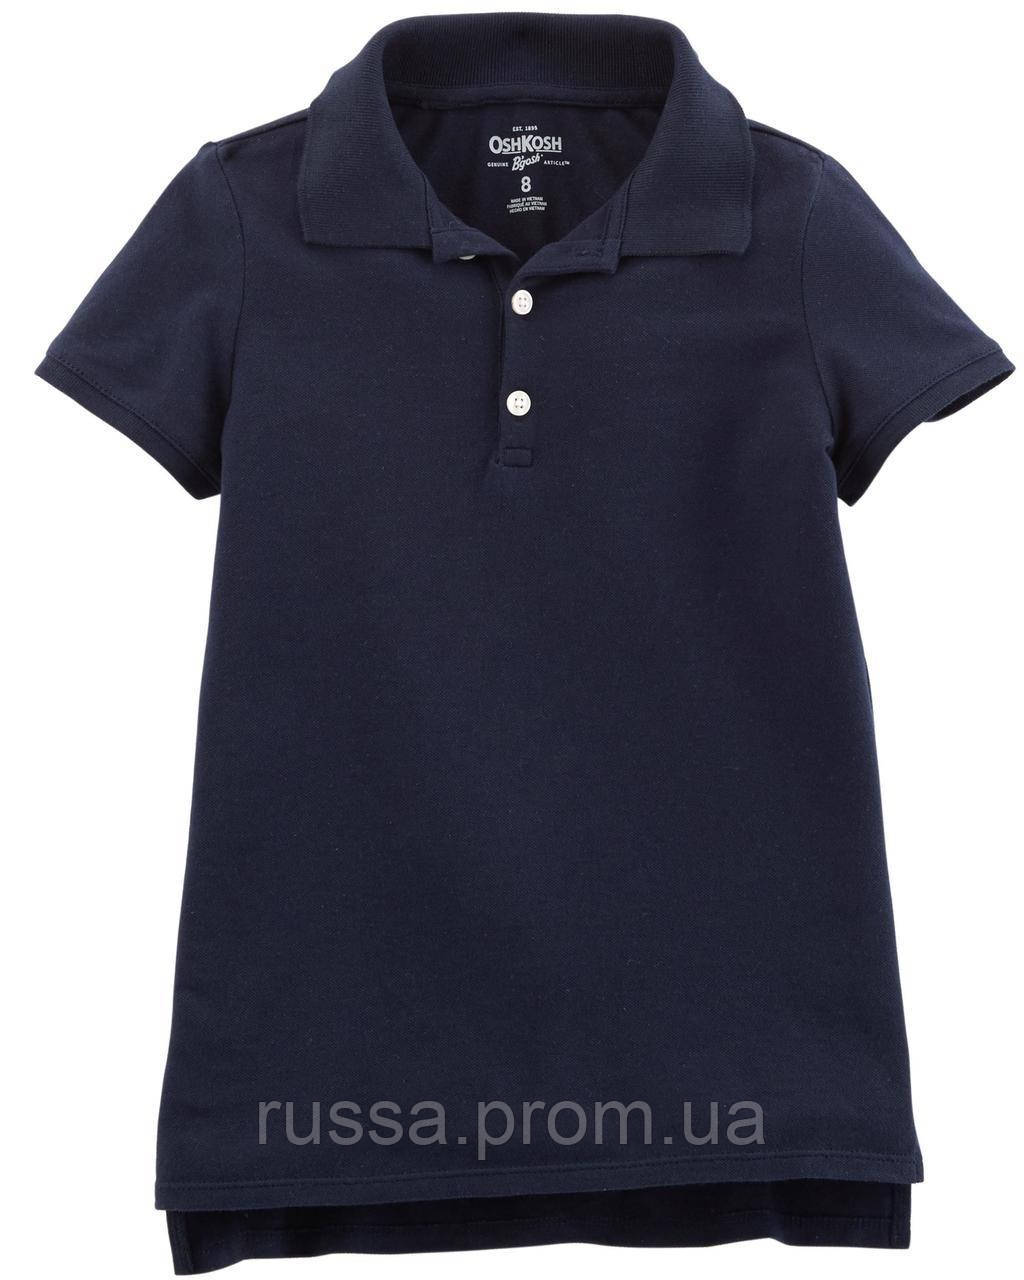 Синяя футболка поло OшКош для девочки